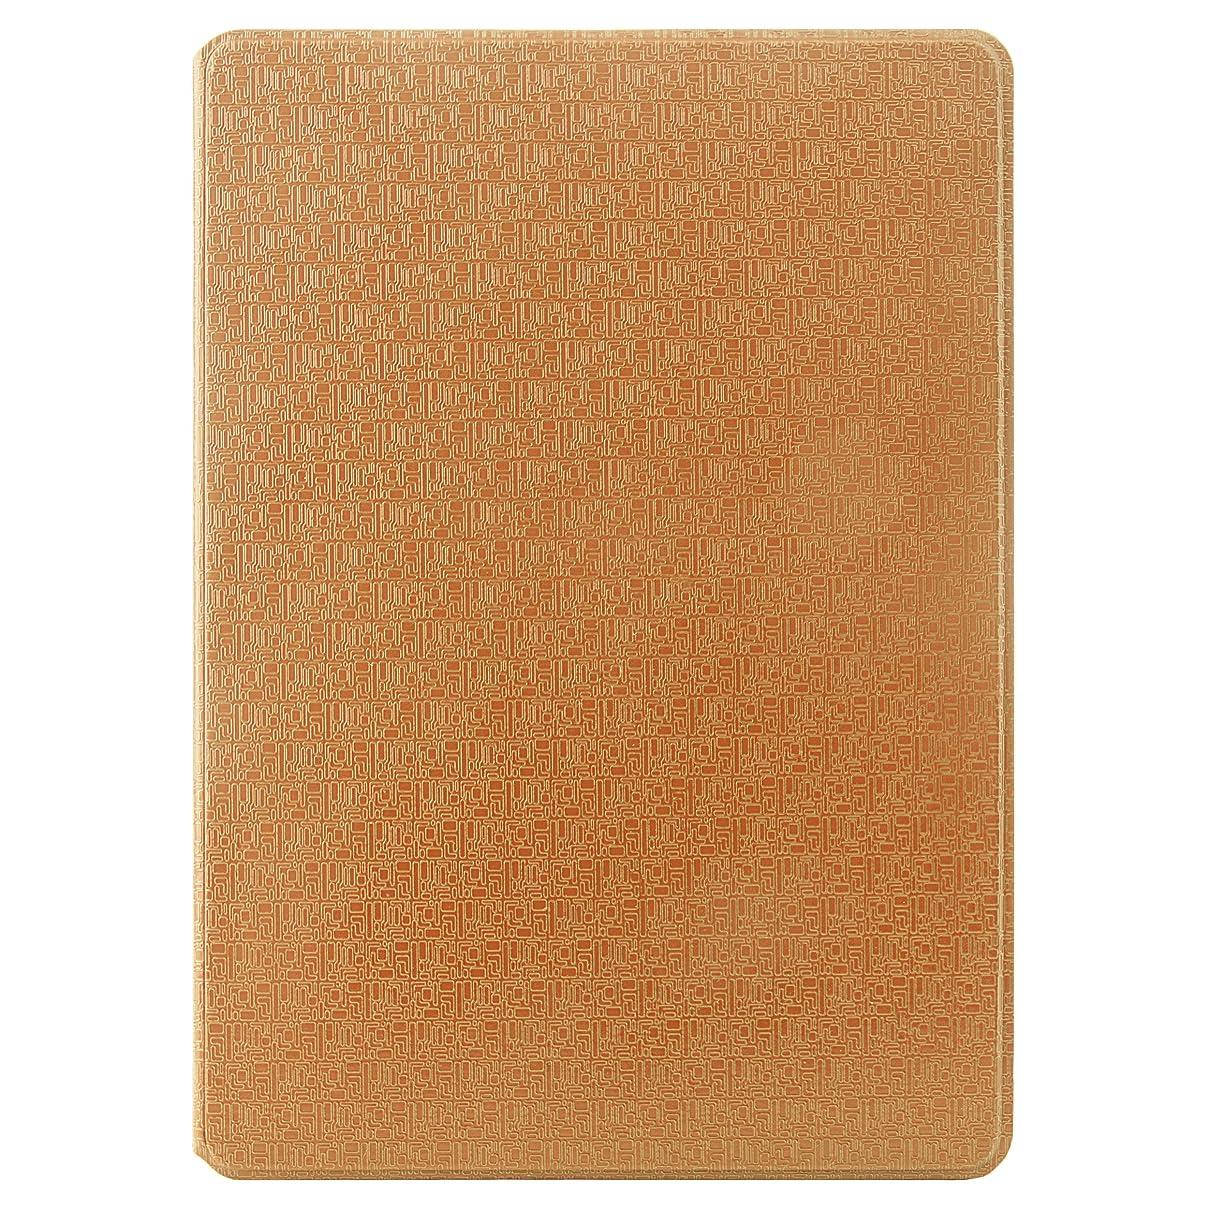 SumacLife Vegan Leather Design Portfolio Case for iPad Air 2 - Self Stand, 3 Card Slots, Handle, and Camera Hole (LthrDsgnIPA2GLD)